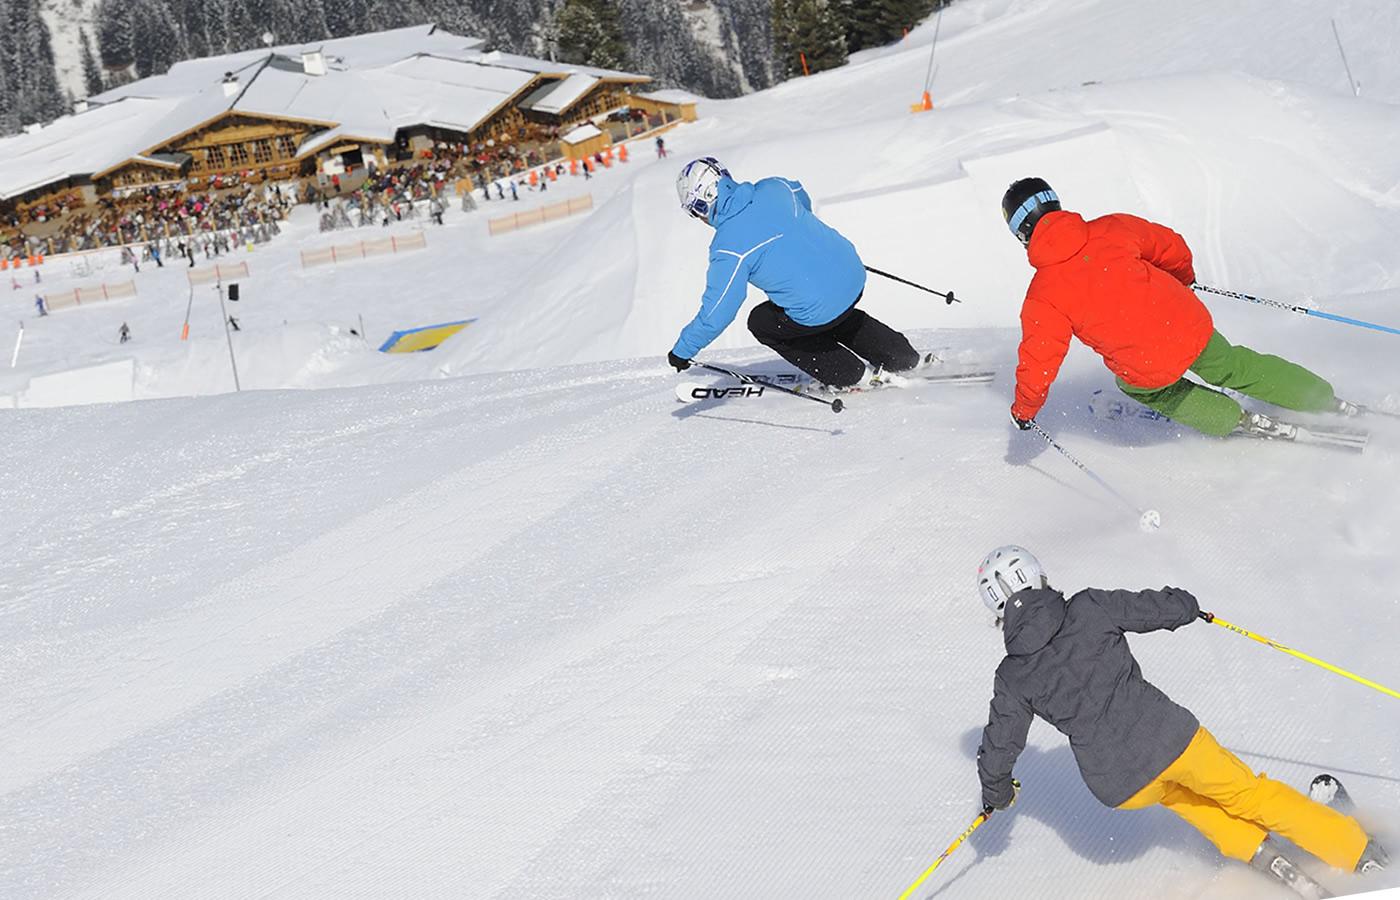 Gruppen Ski fahren in Serfaus-Fiss-Ladis - Fiss Nordseite.